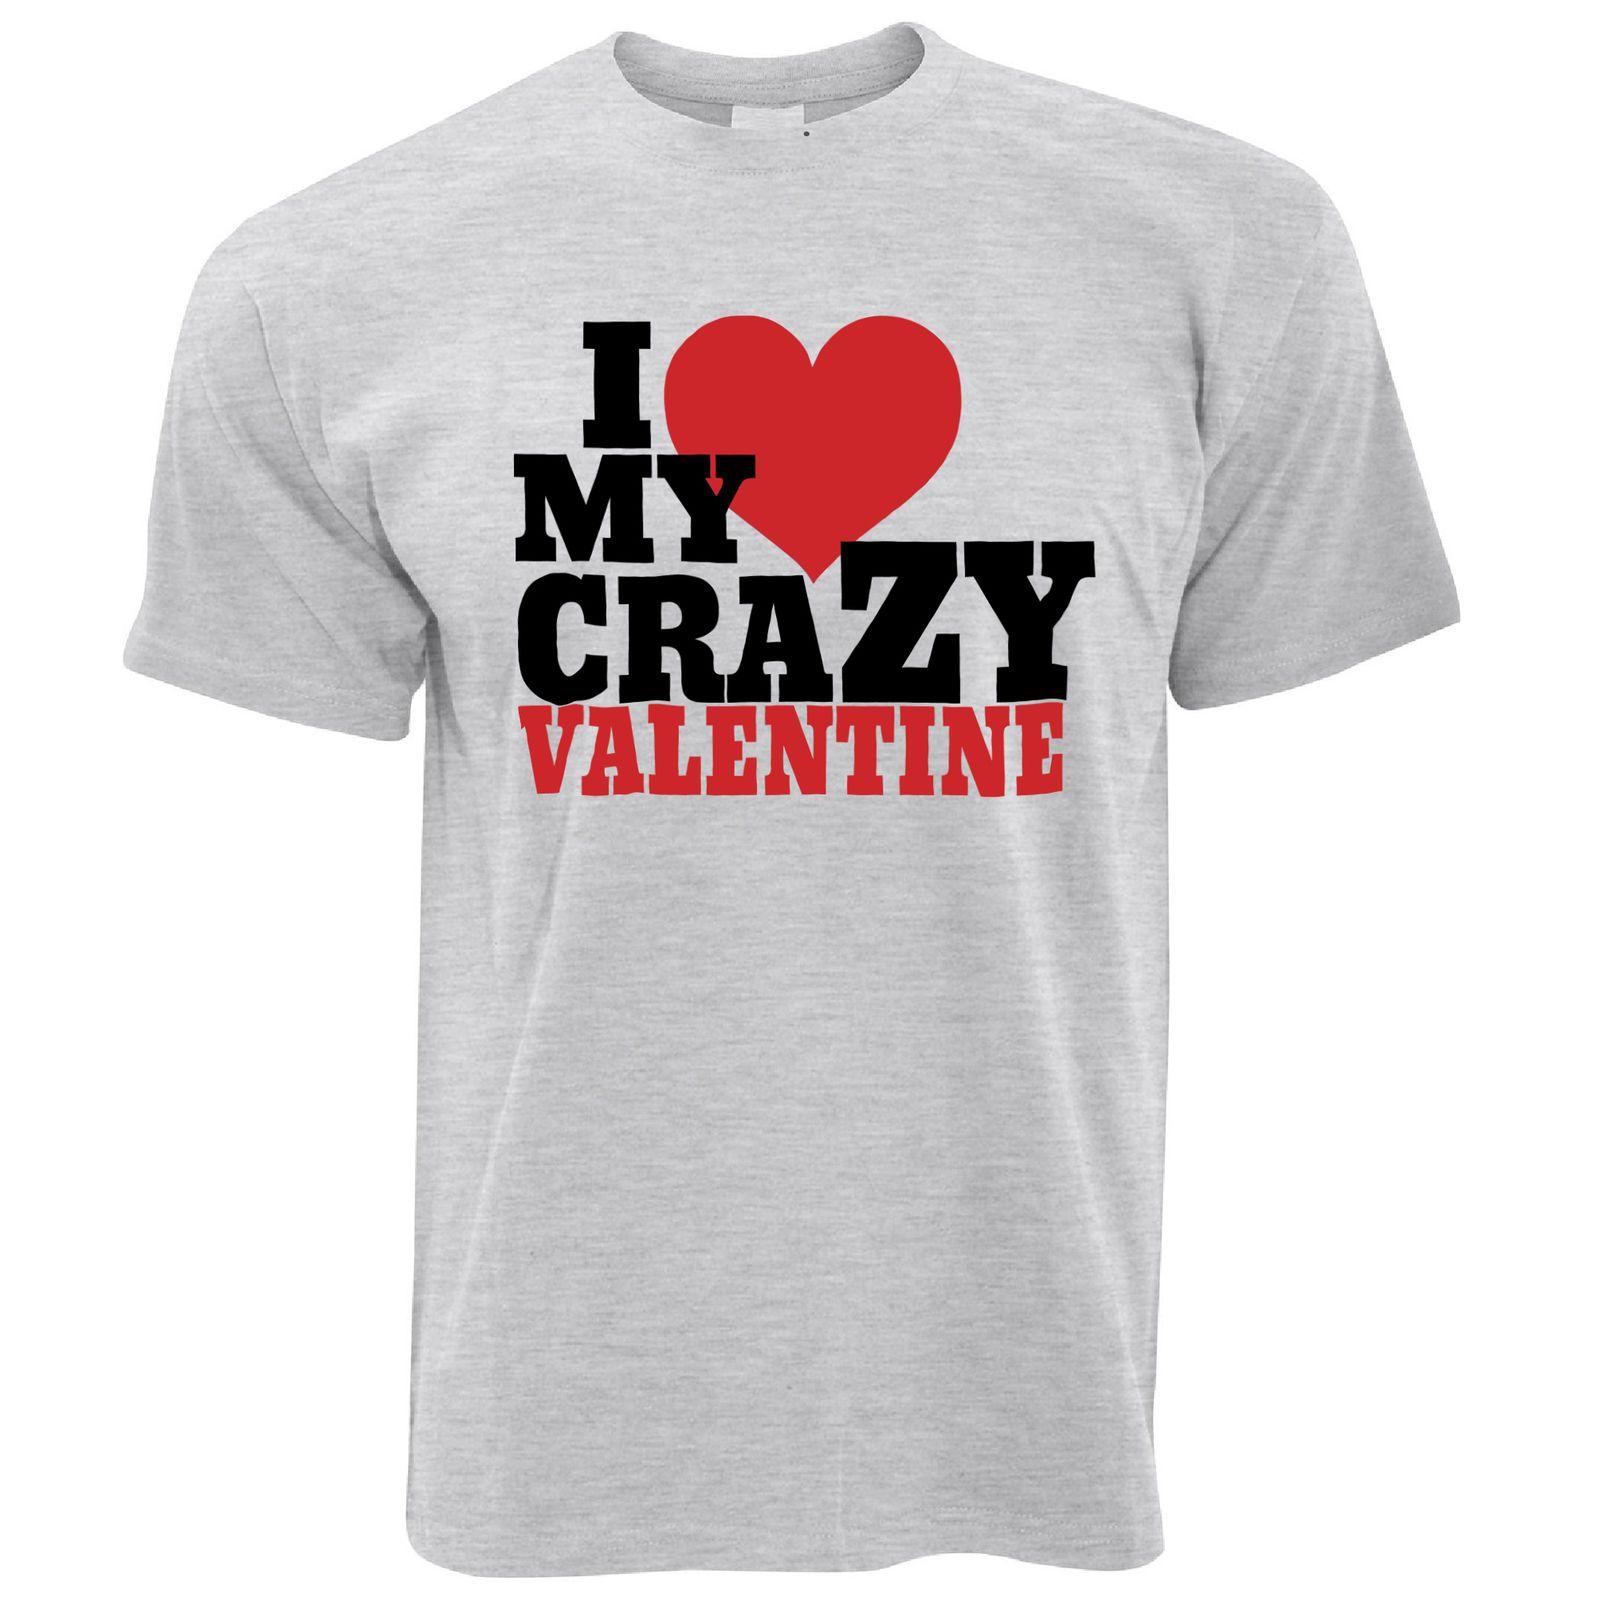 89825df7 Couples T Shirt I Love My Crazy Valentine Valentine's Day Sassy Joke Cute